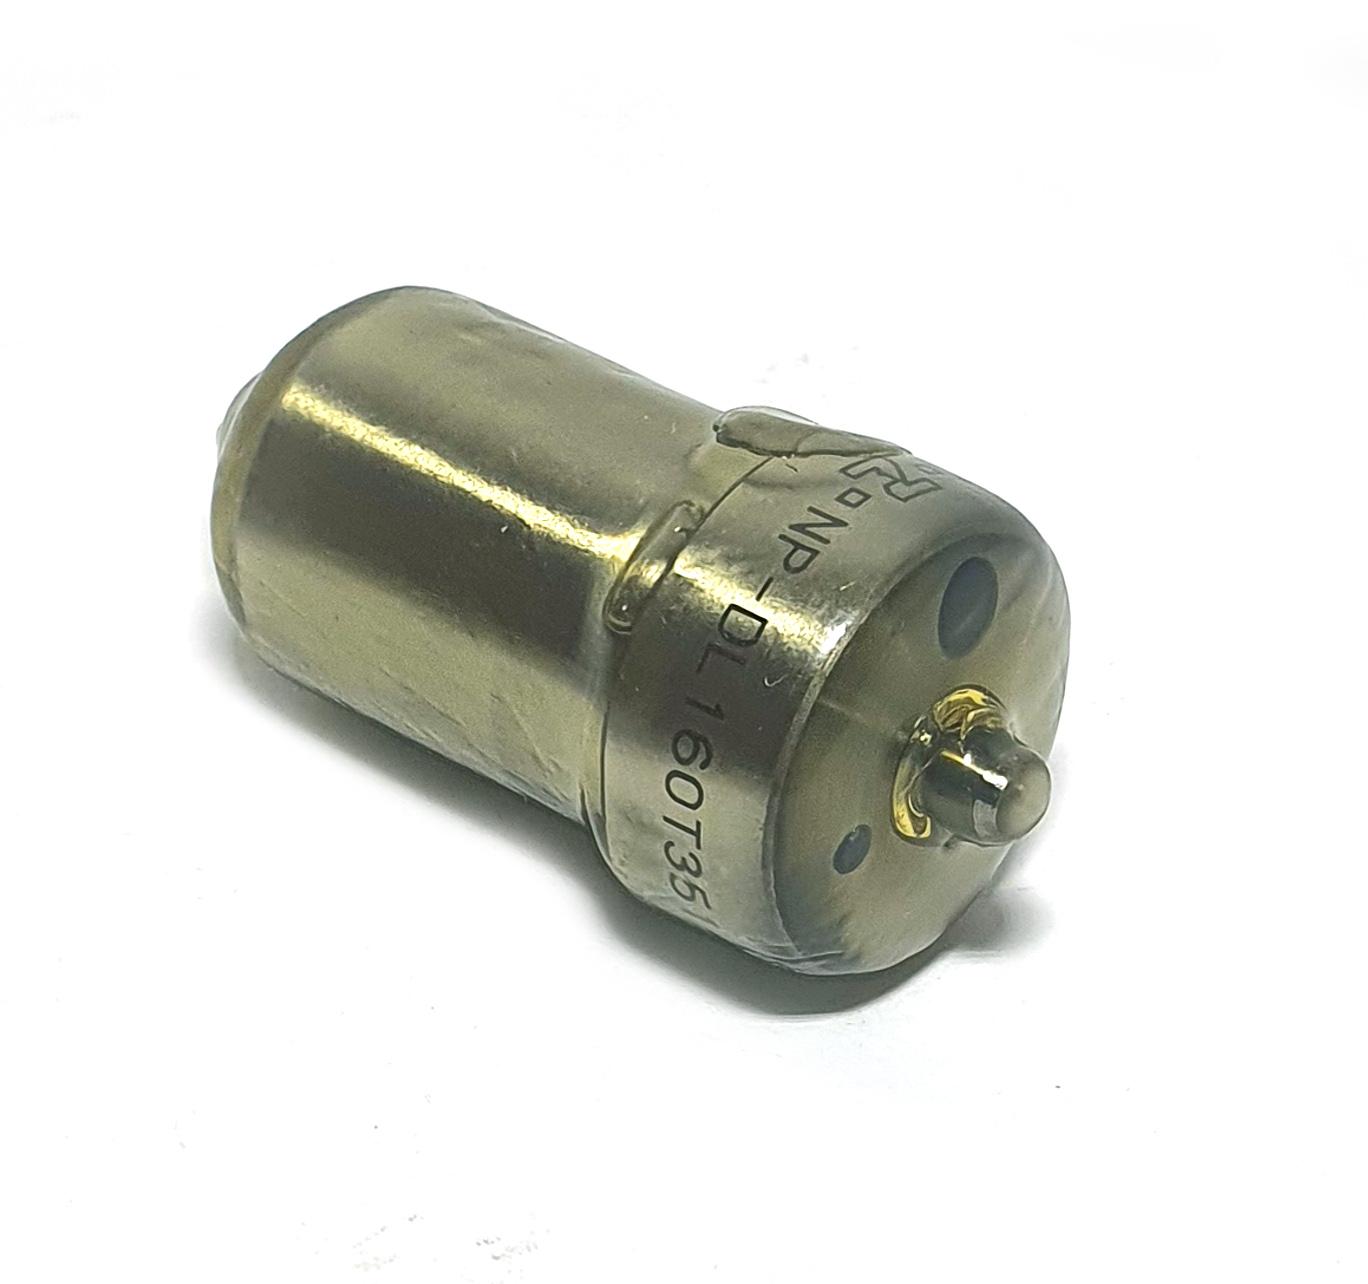 elemento bico injetor mitsubishi S16R-PTA - pn 37561-17100